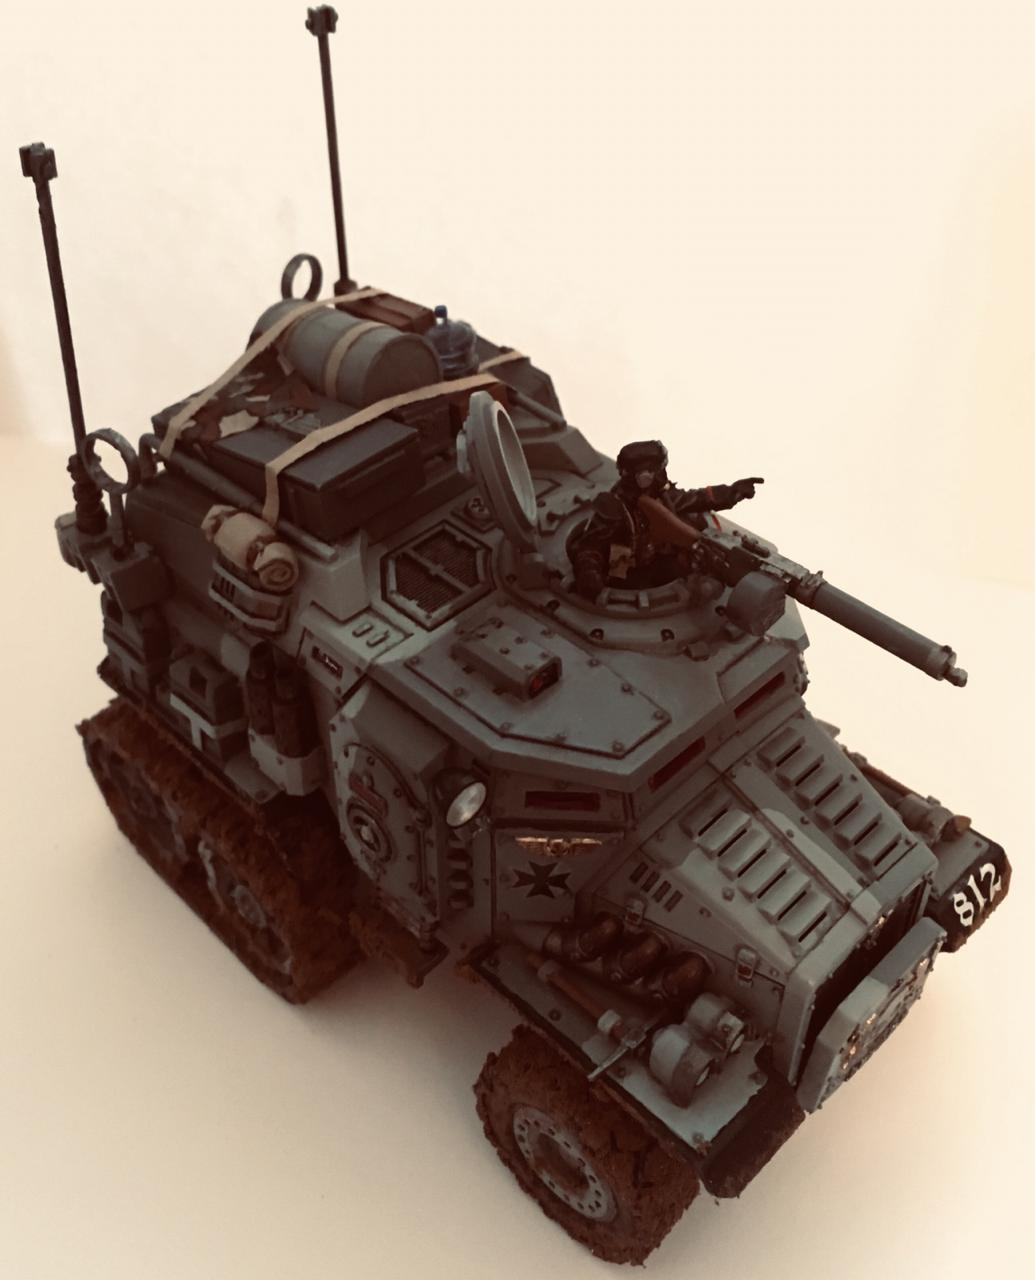 Astra Militarum, Cargo, Death Korps of Krieg, Imperial Guard, Stowage, Taurox